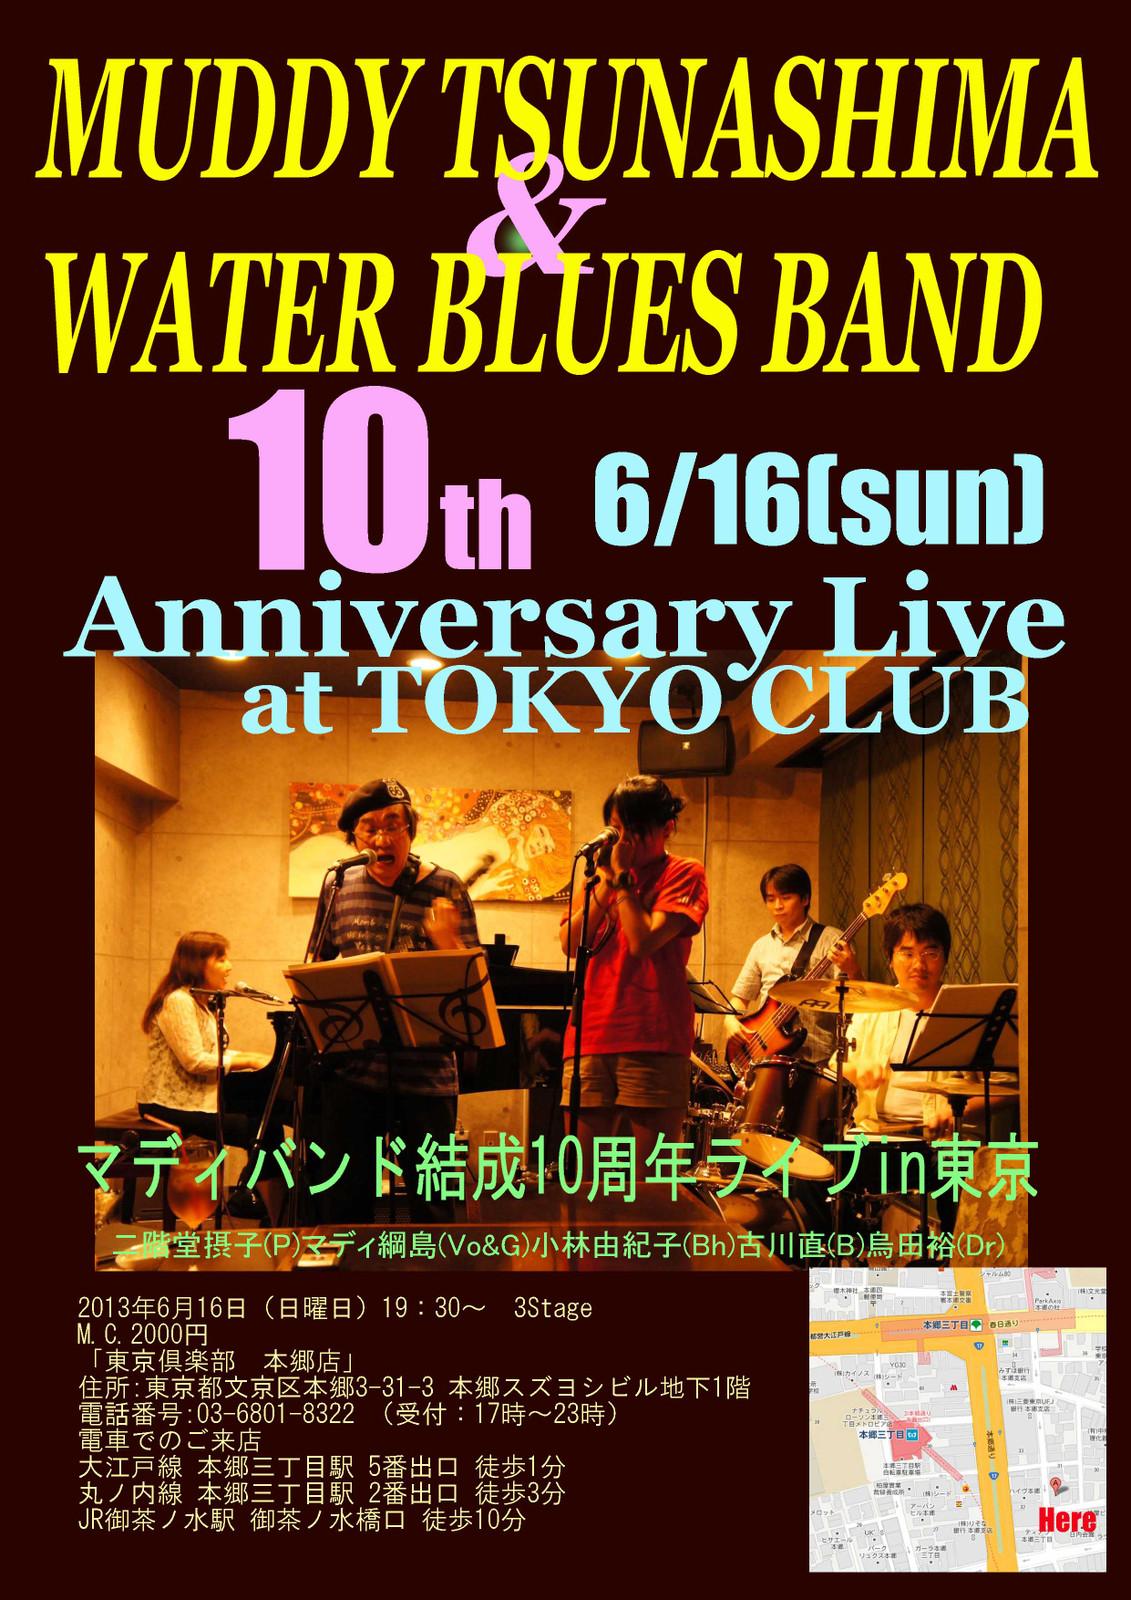 Tokyoclub20130616_light2